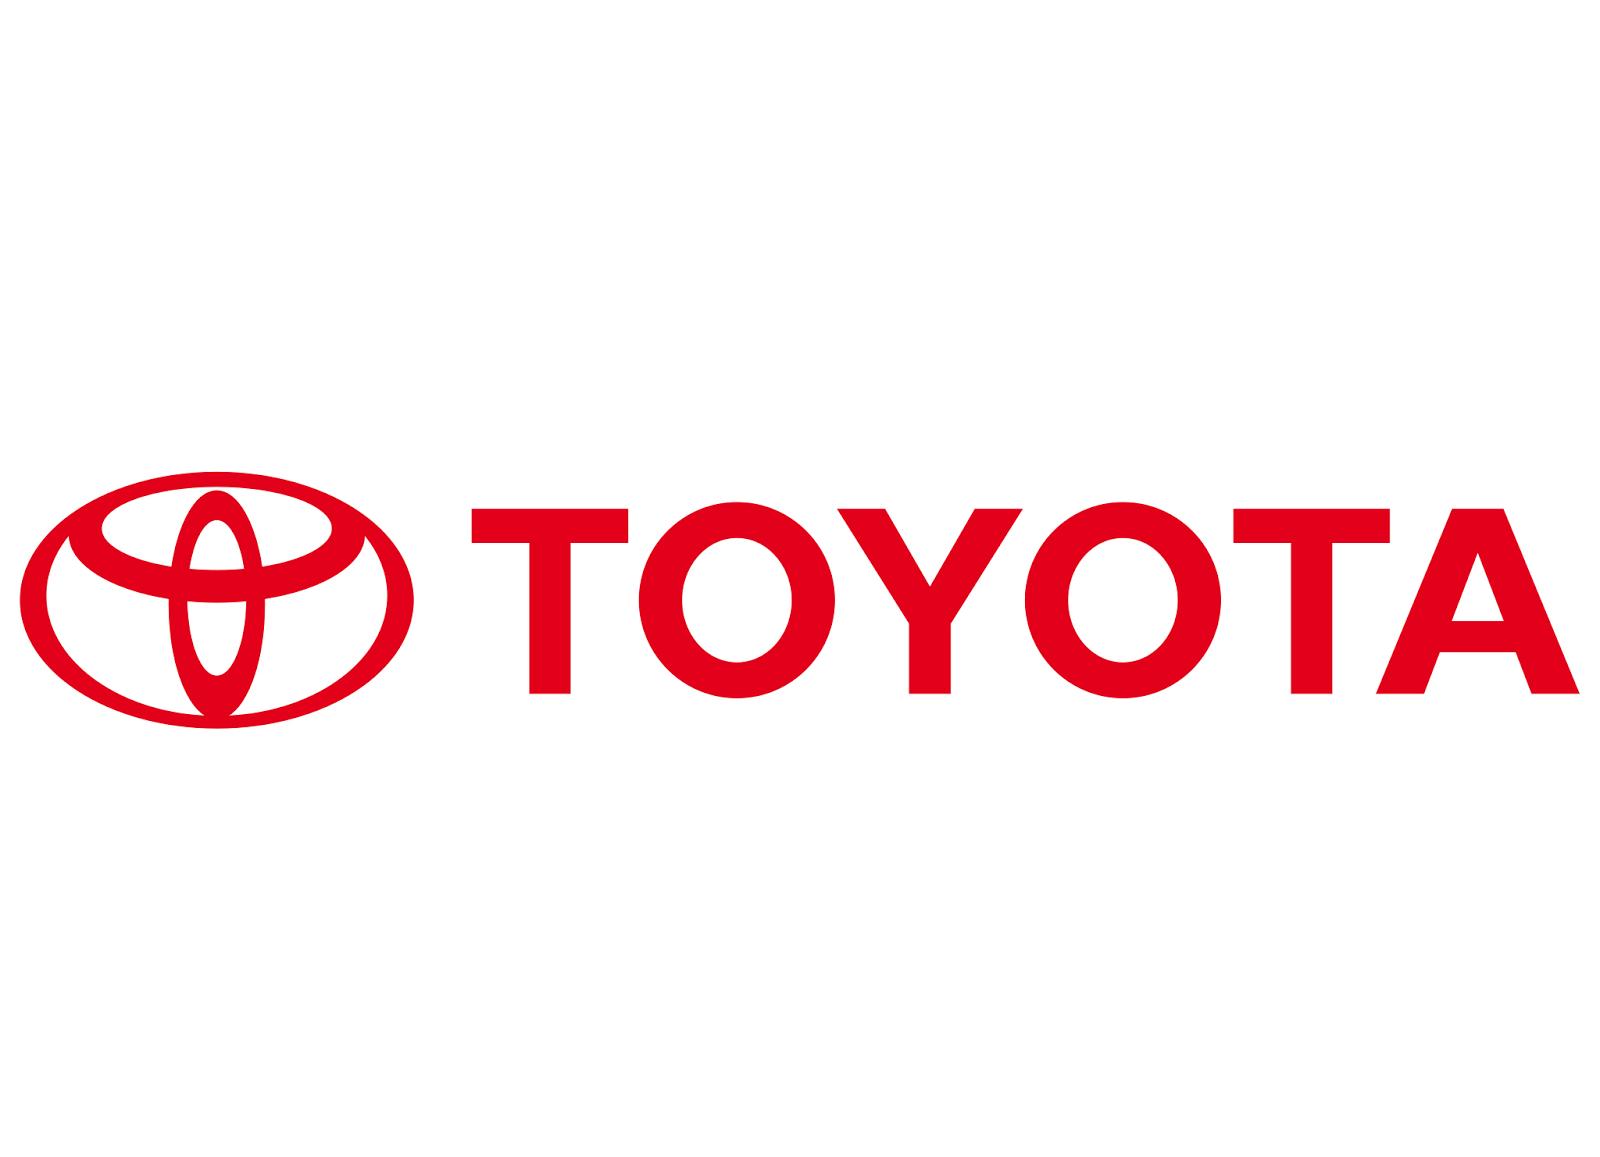 toyota logo 6 toyota logo 7 toyota logo 8 toyota 1600x1157